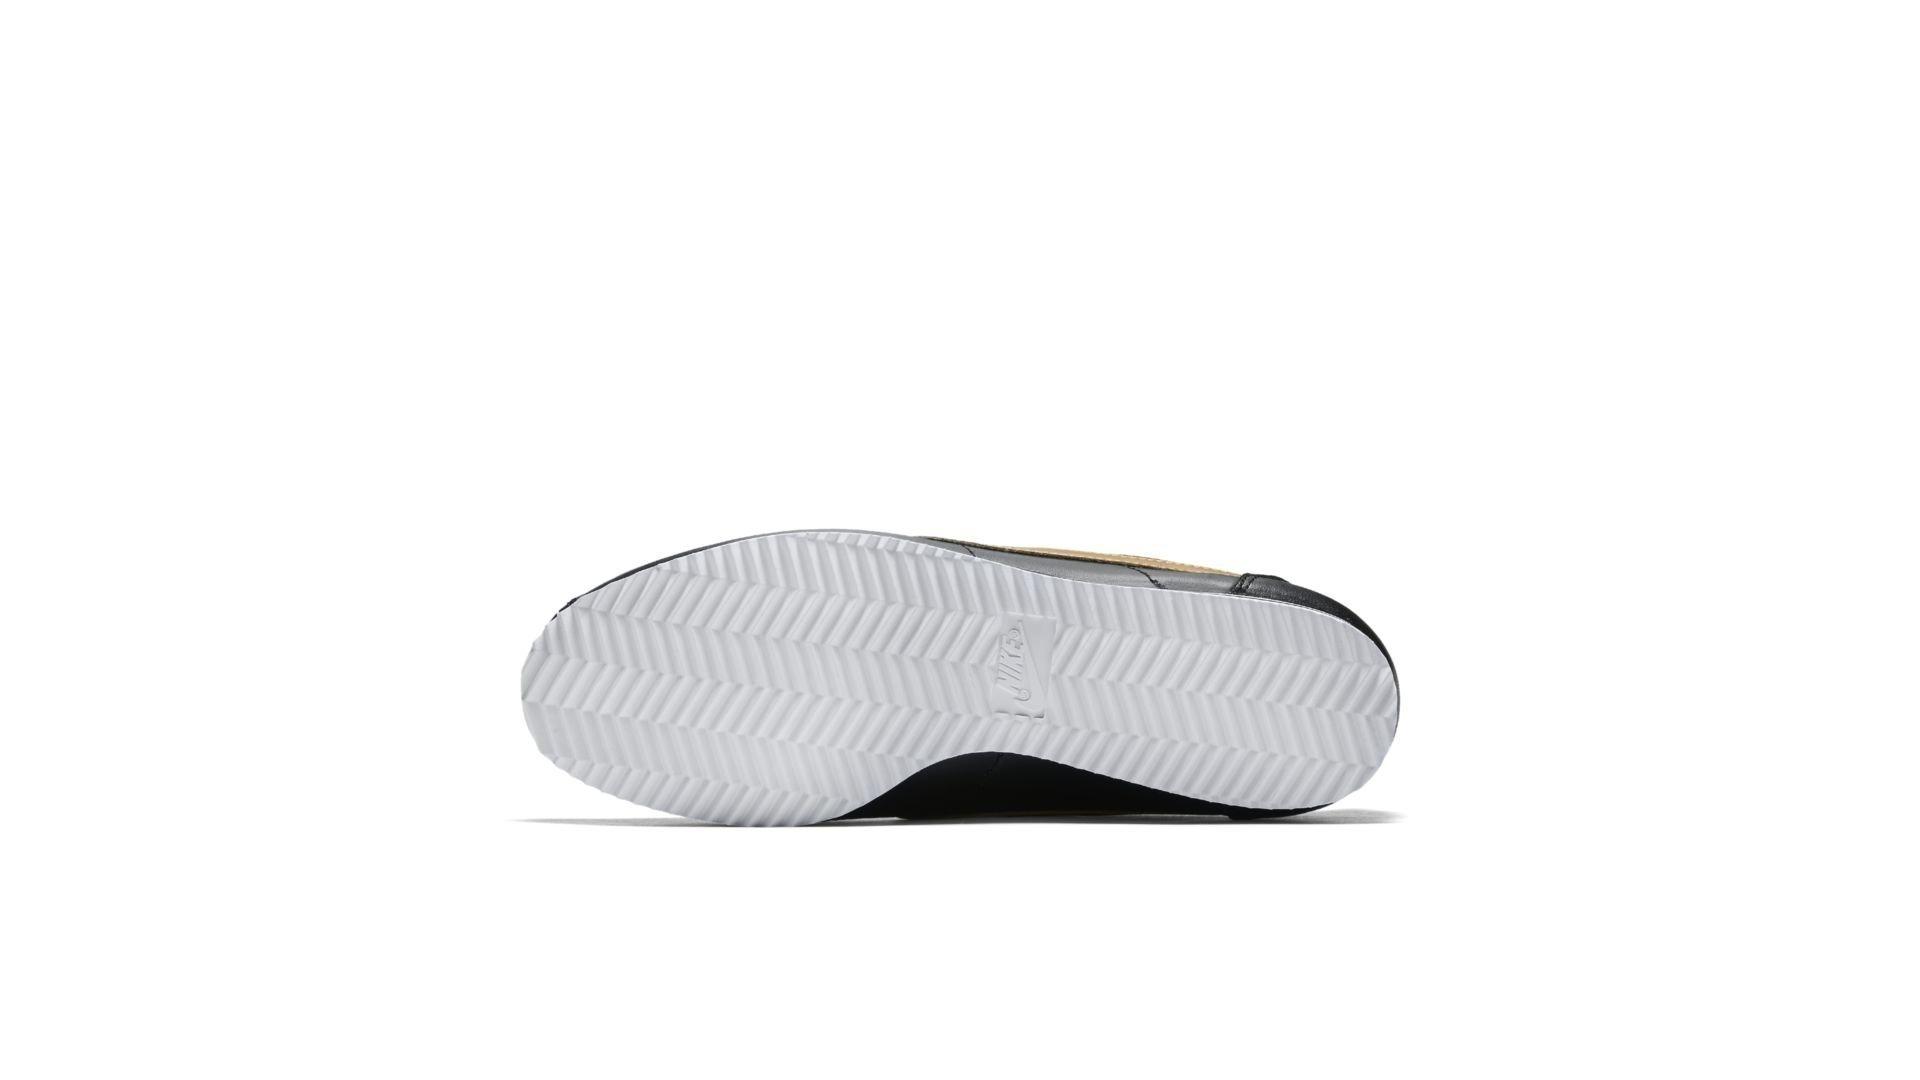 Nike Cortez Leather Black Gold (W) (807471-012)